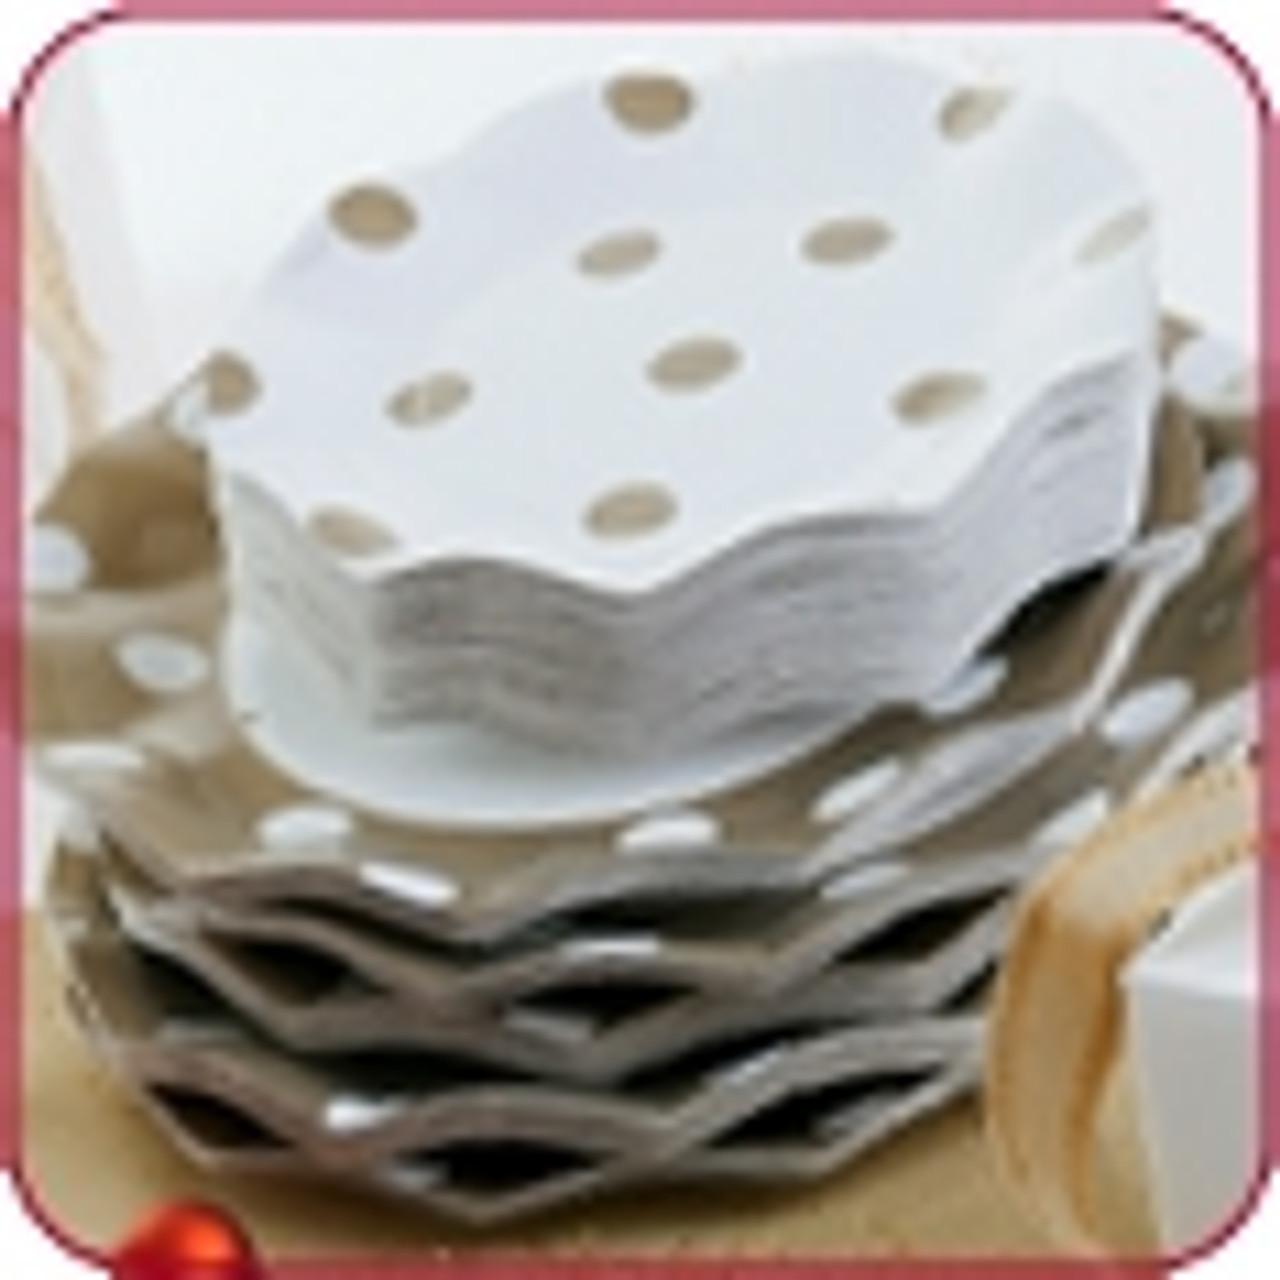 Single-Use Plates